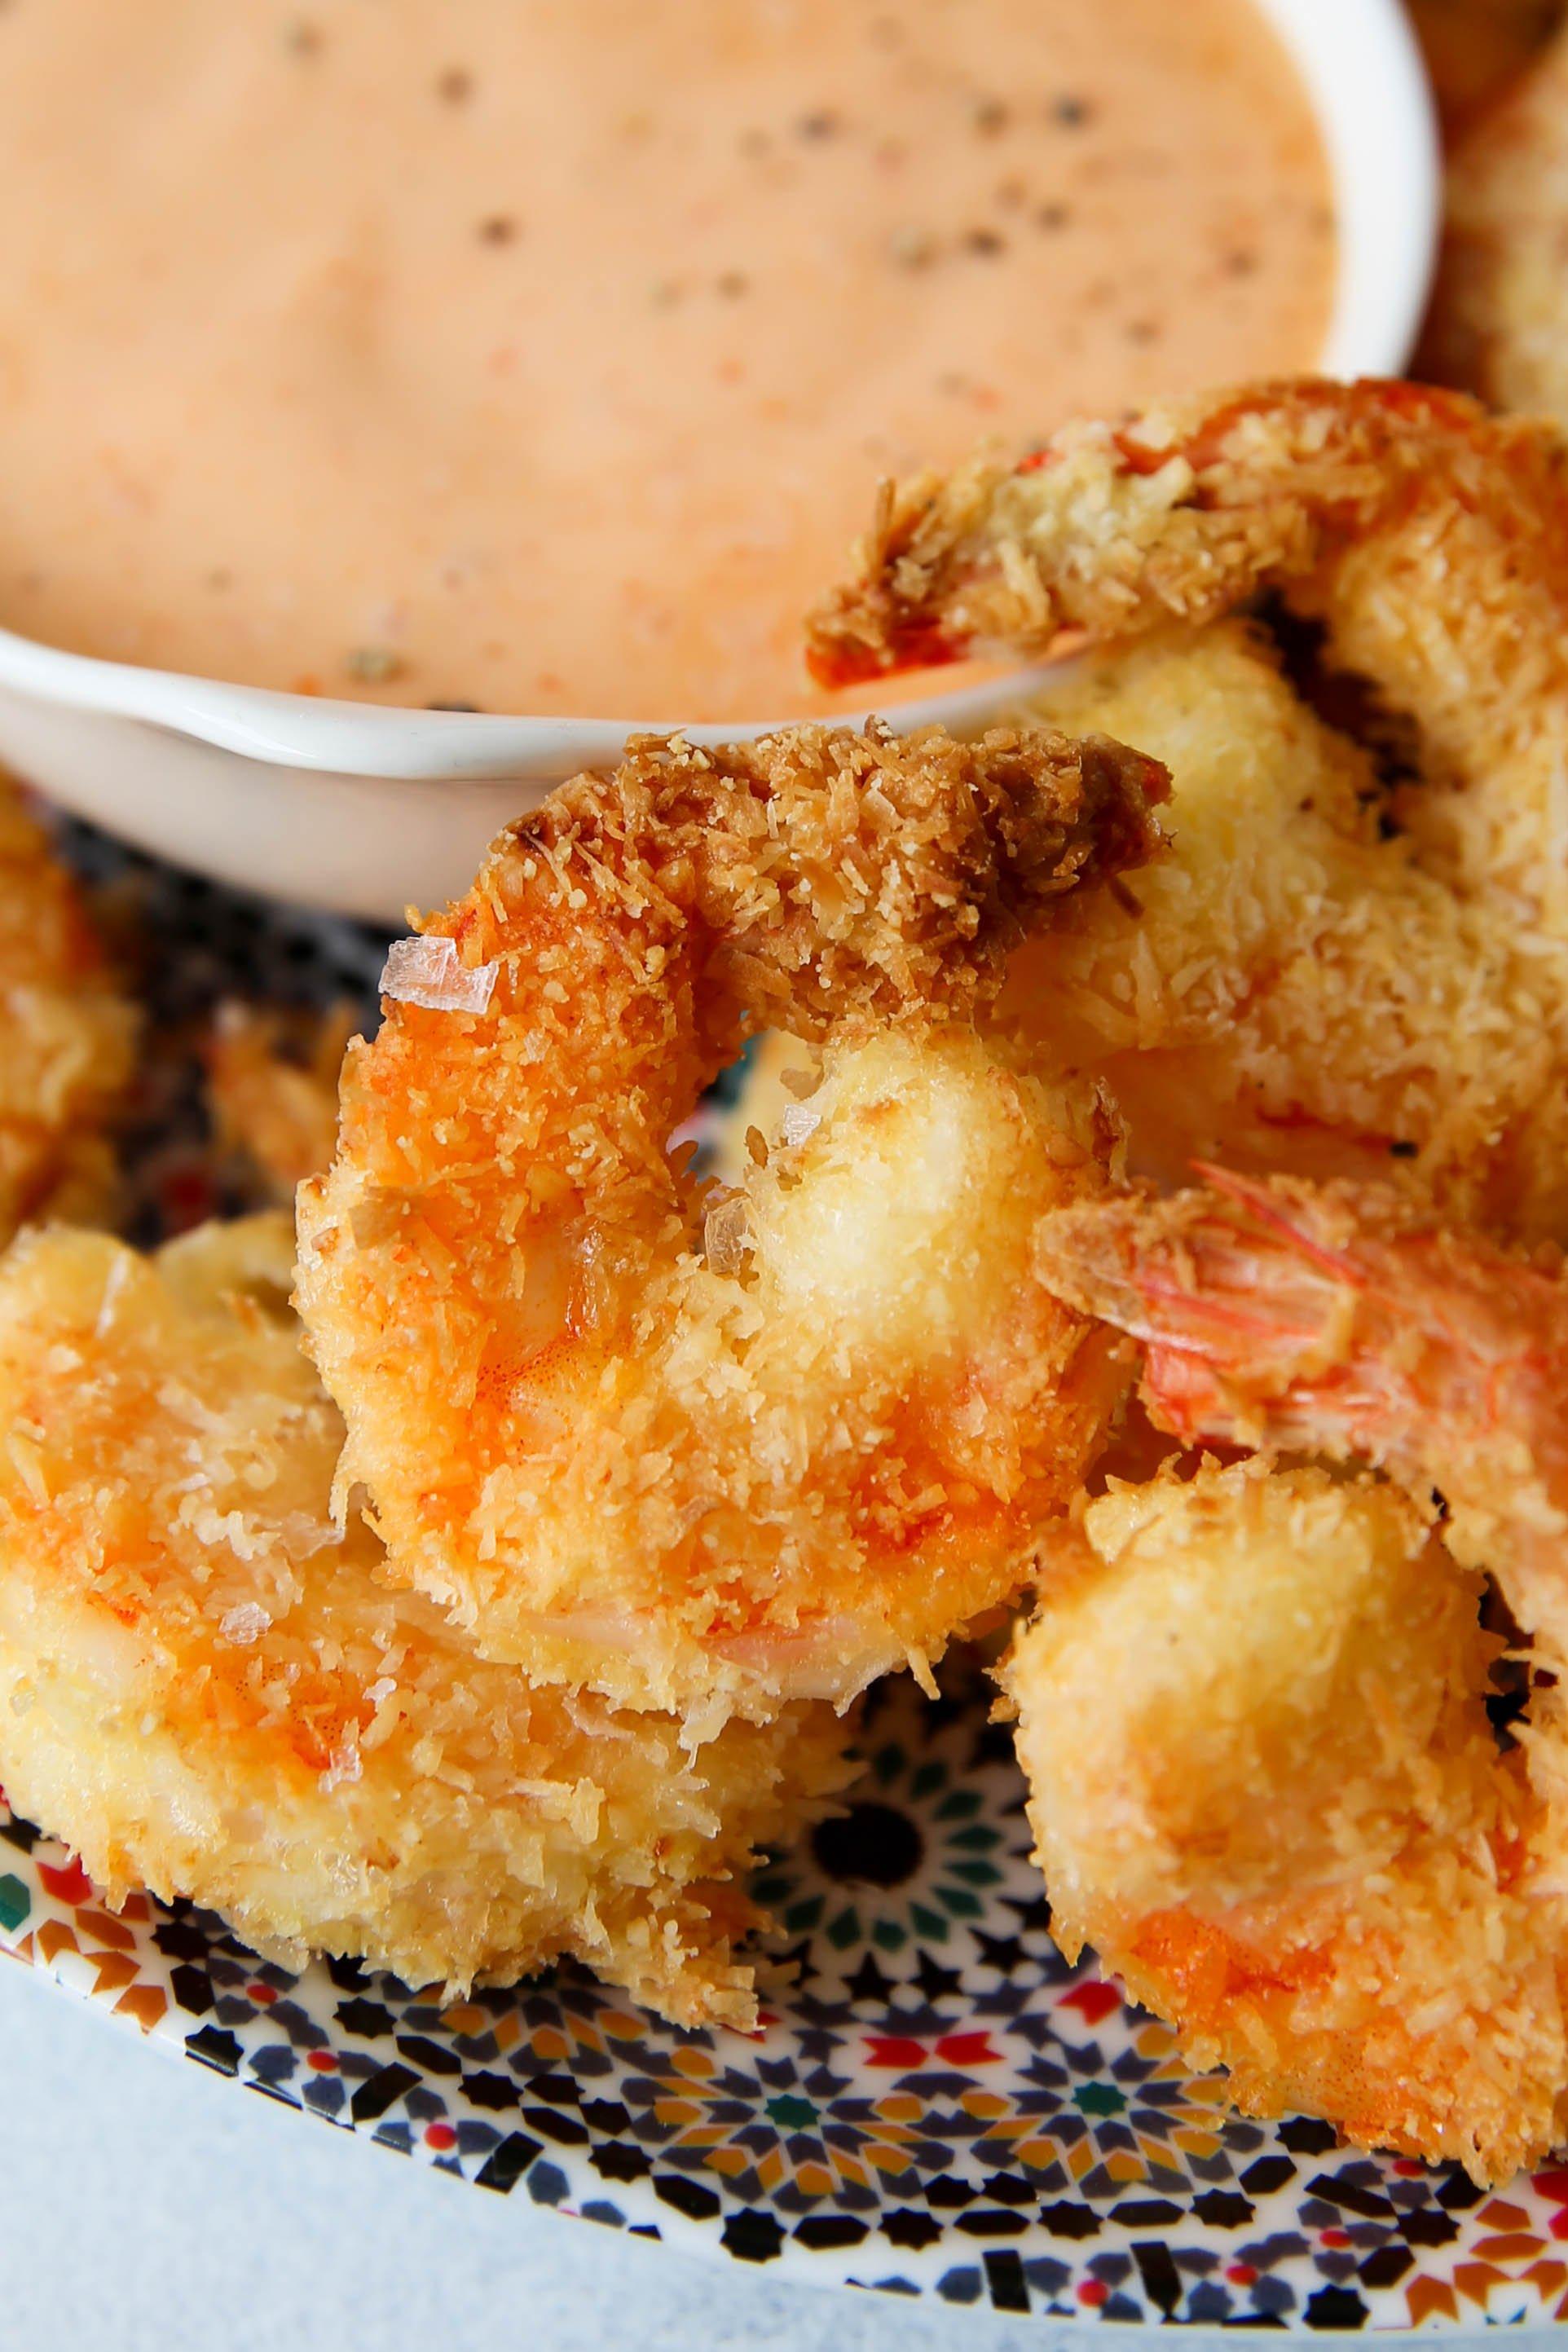 PaleOMG Air Fryer Coconut Shrimp with Sriracha Dipping Sauce